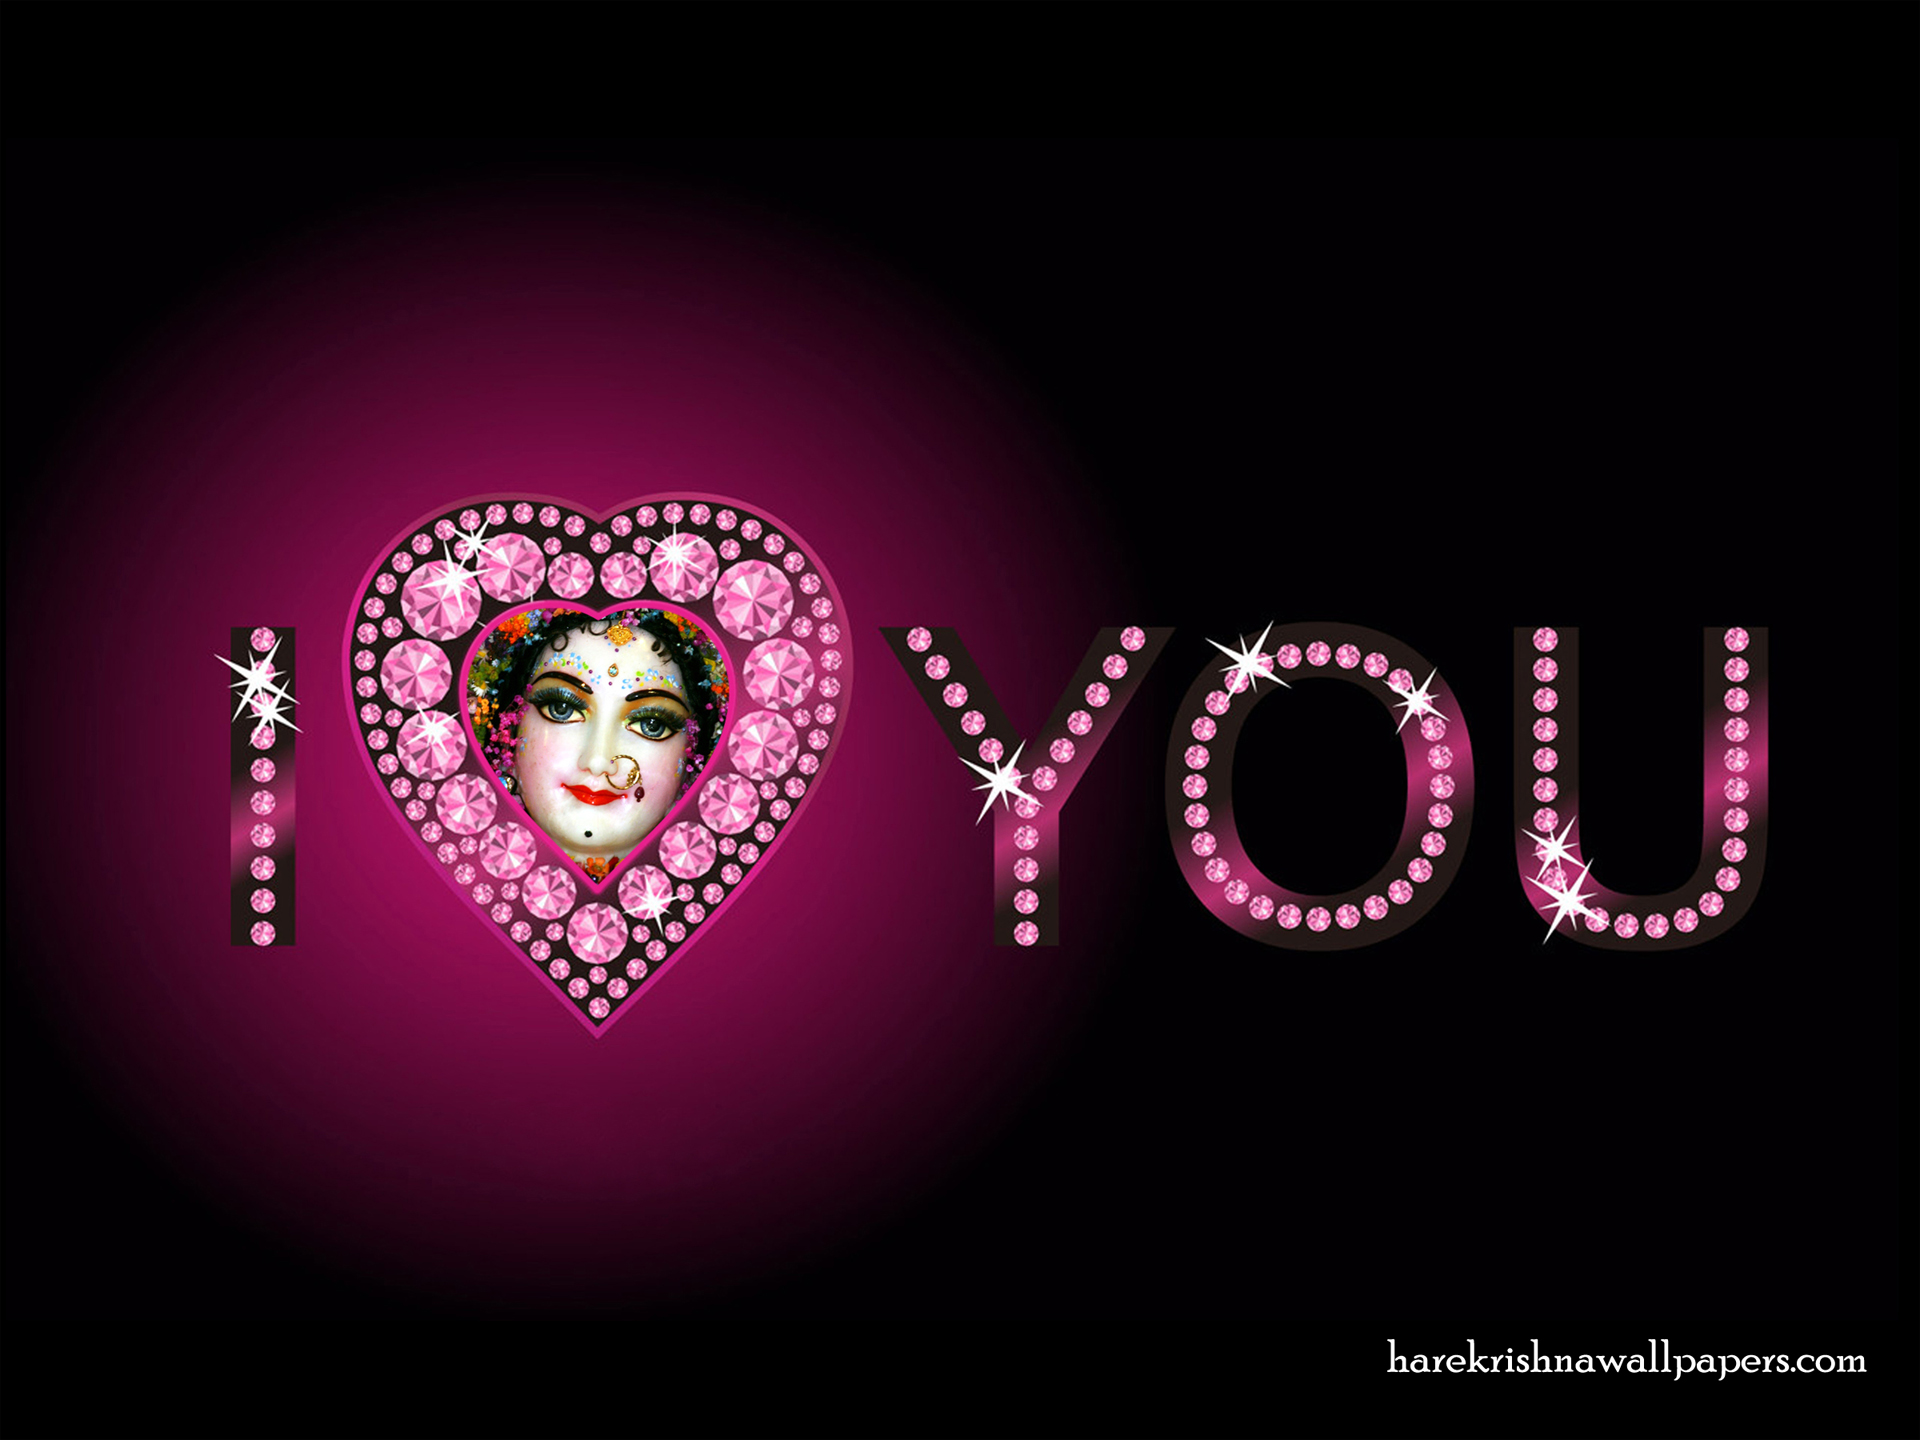 I Love You Radharani Wallpaper (014) Size 1920x1440 Download